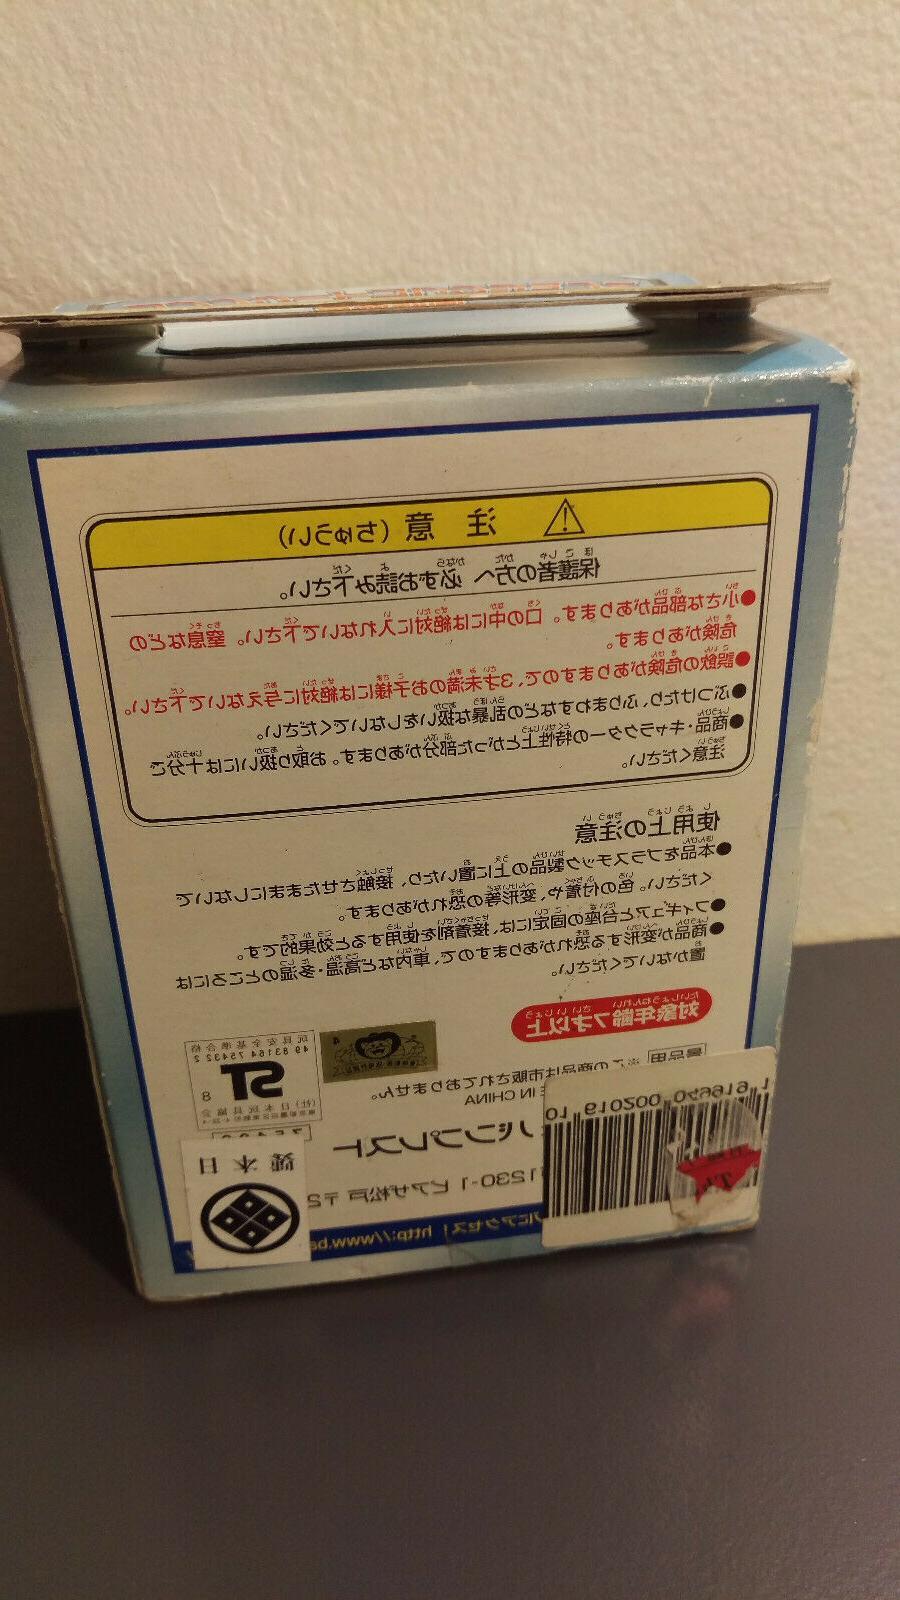 Toei Complete 2 Action Sealed Banpresto 1998